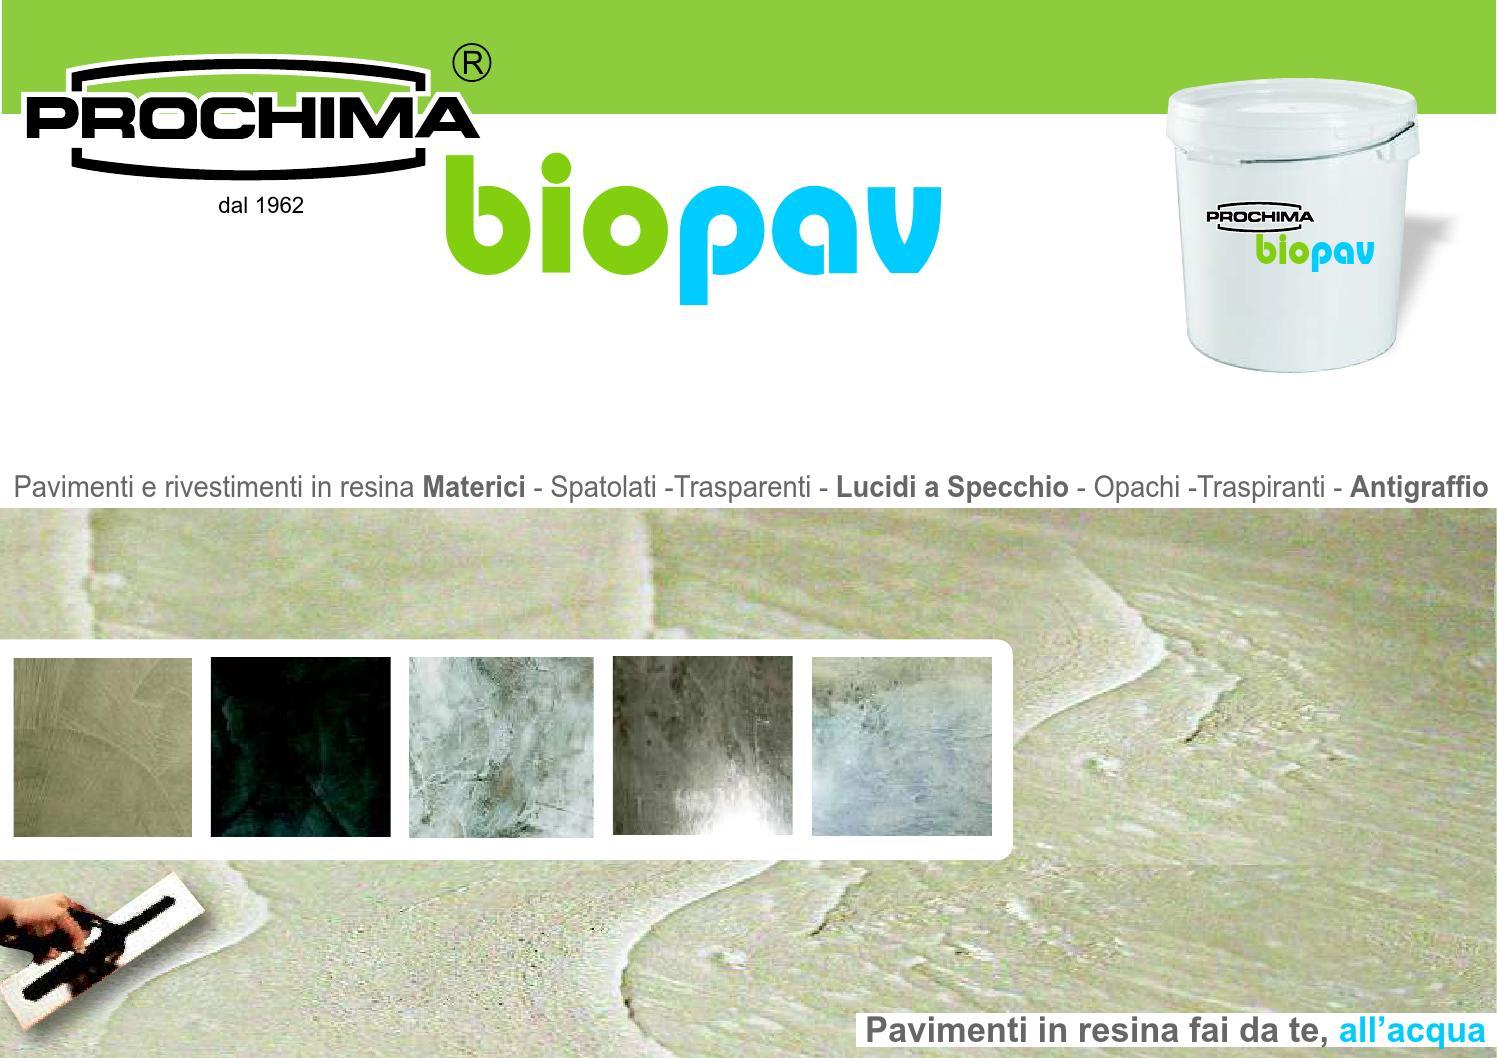 Biopav pavimenti in resina catalogo 2018 by prochima issuu for Pavimenti in resina fai da te